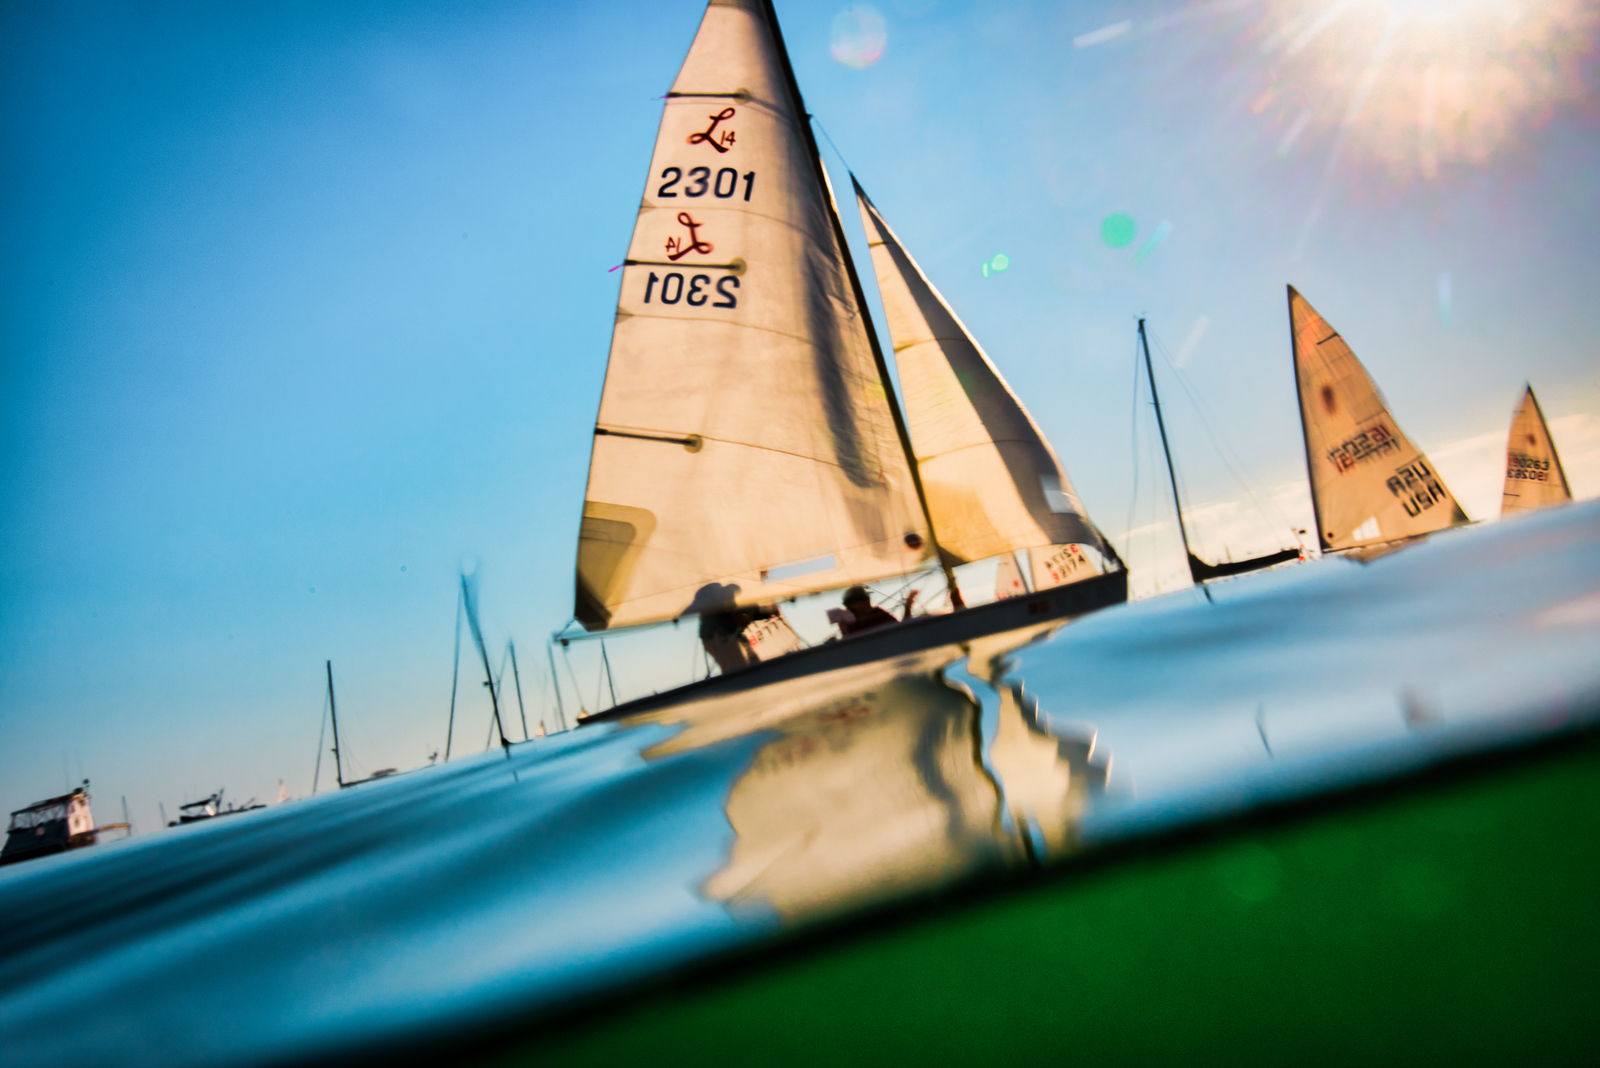 7/5/176:19:40 PM---TWednesday Night Twilight Racing at Balboa Yacht ClubPhotos  Tom Walker